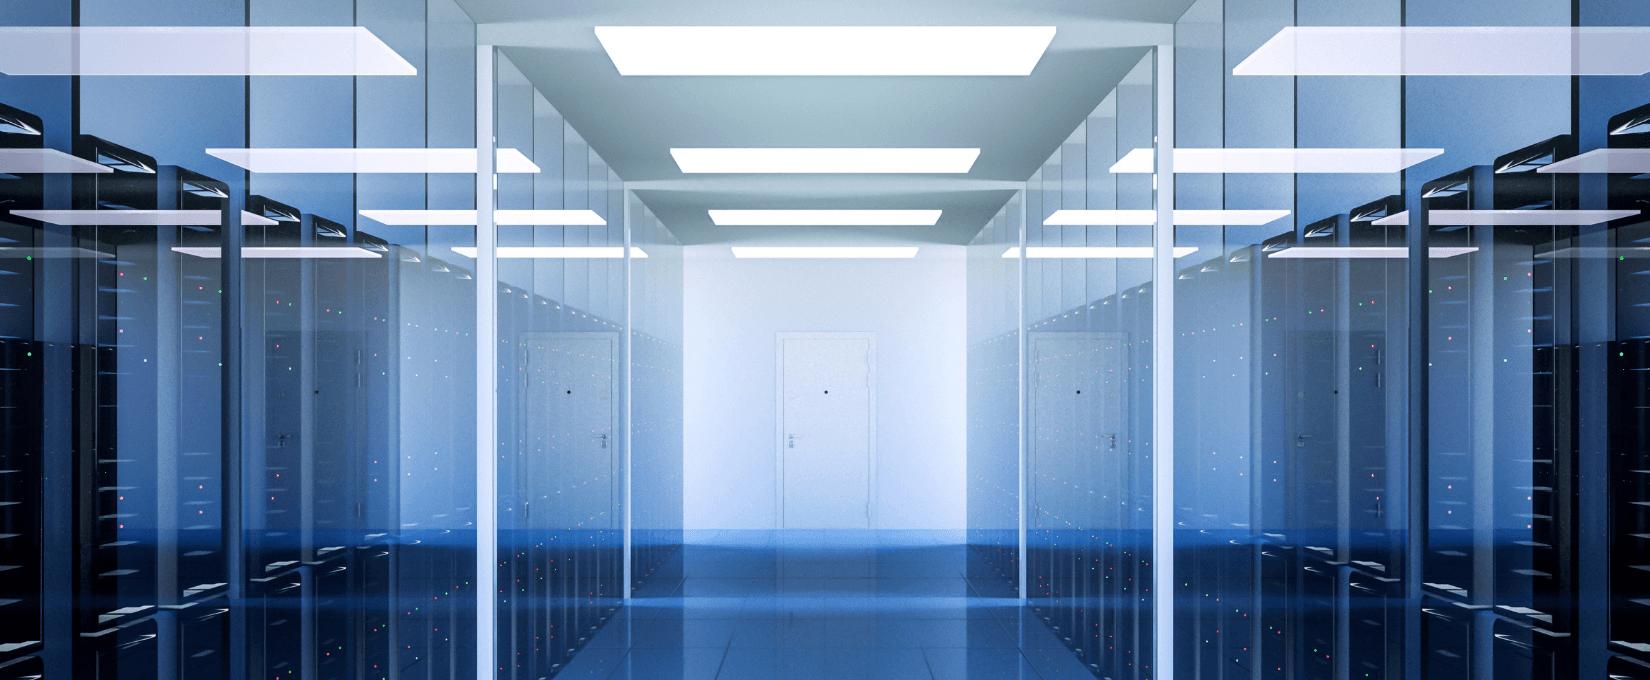 Amazon Redshift Vs Traditional Data Warehouses